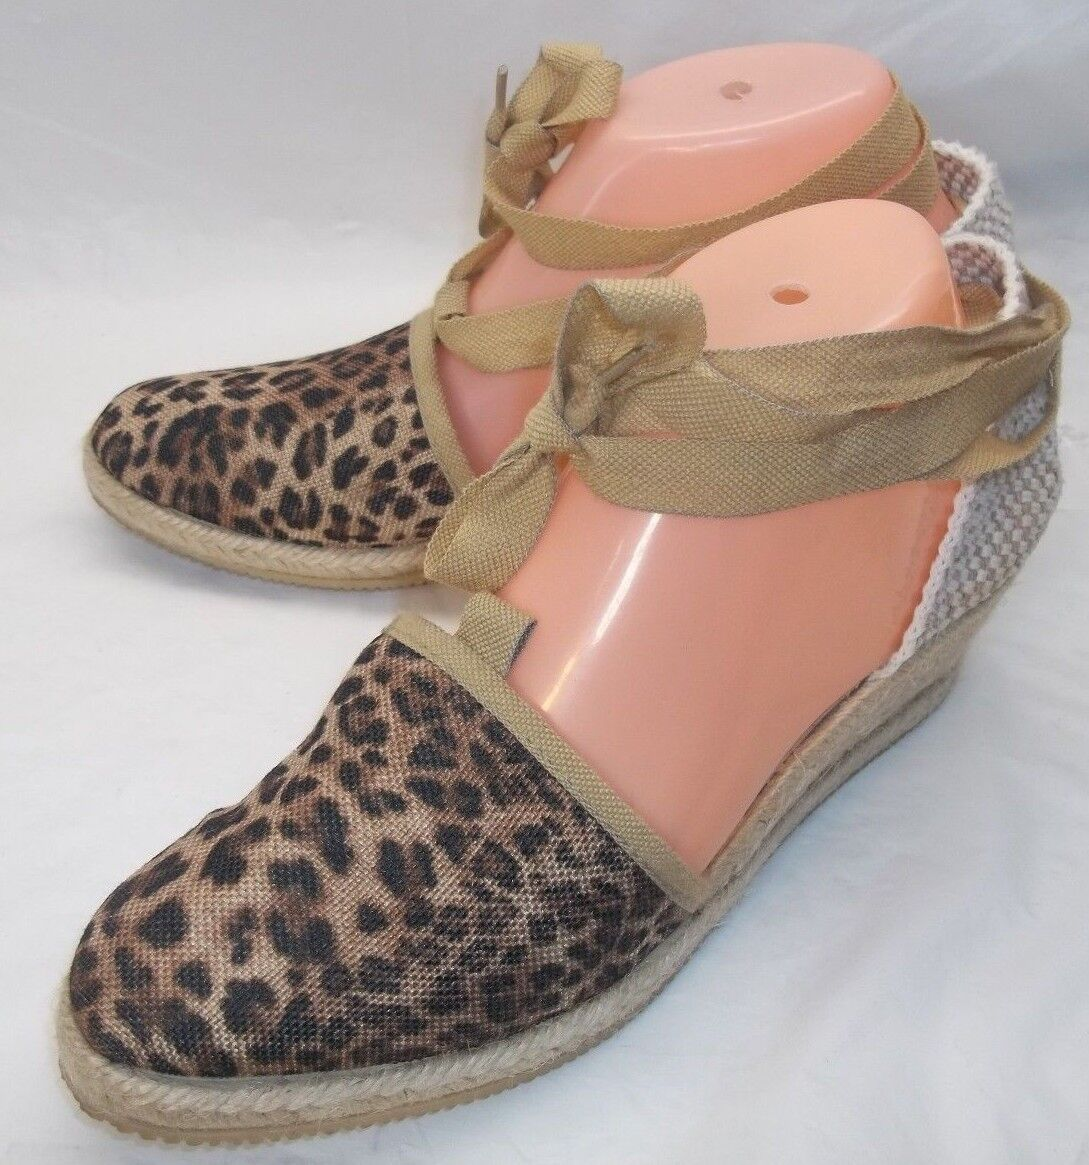 ILSE Jacobsen Hornbaek Wos schuhe Dorsay US 8 Multi-Farbe Cheetah Lace esparilles